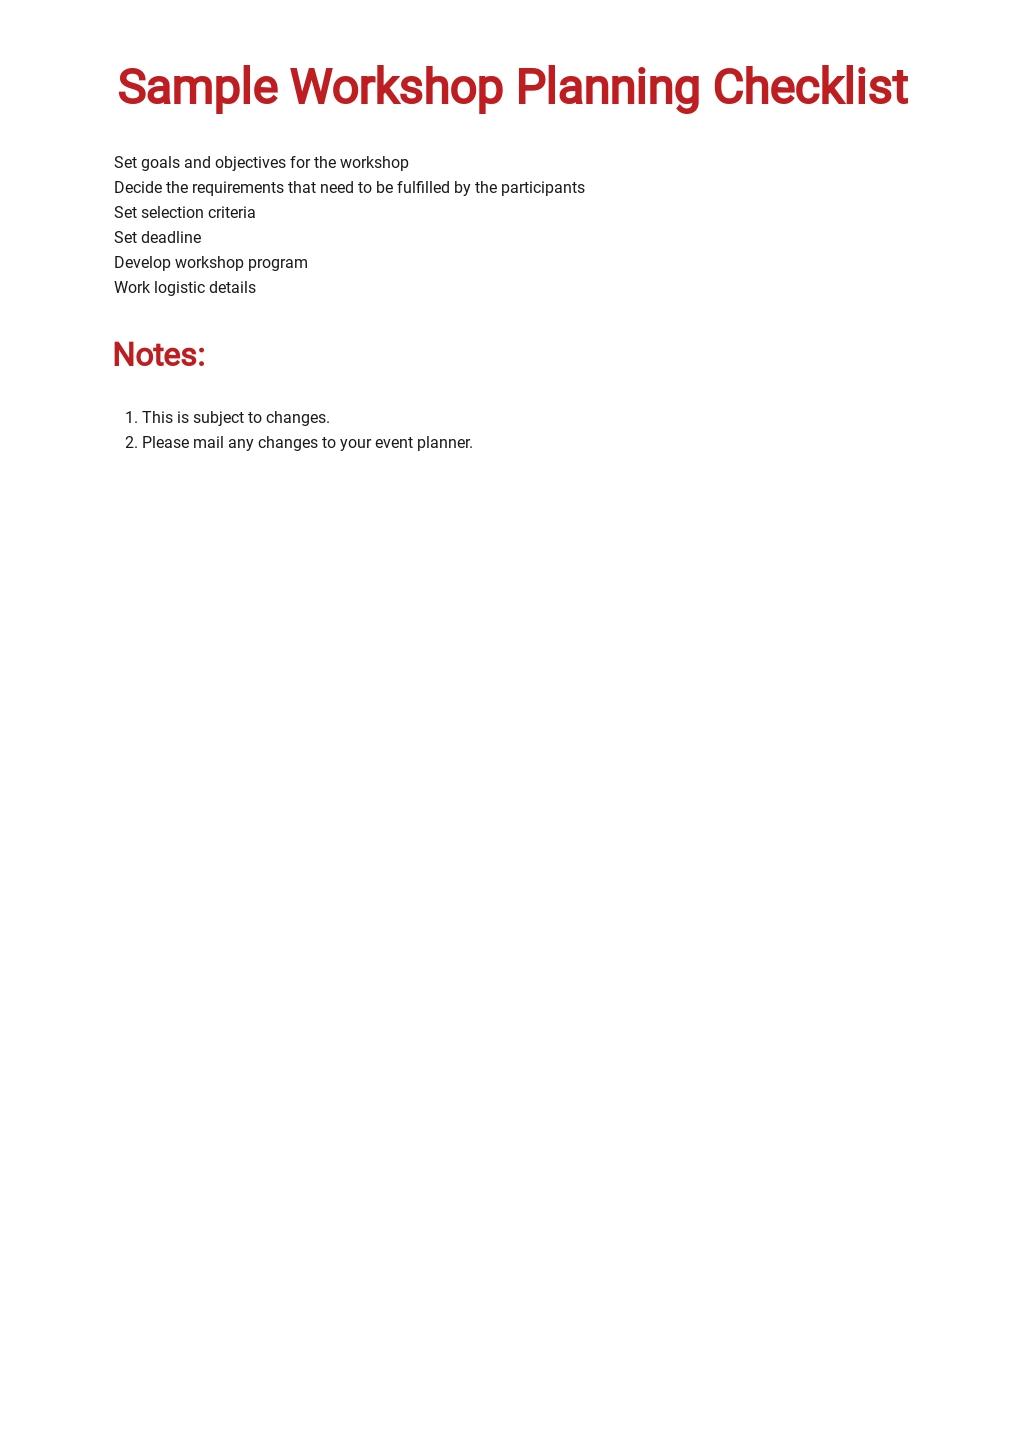 Sample Workshop Planning Checklist Template